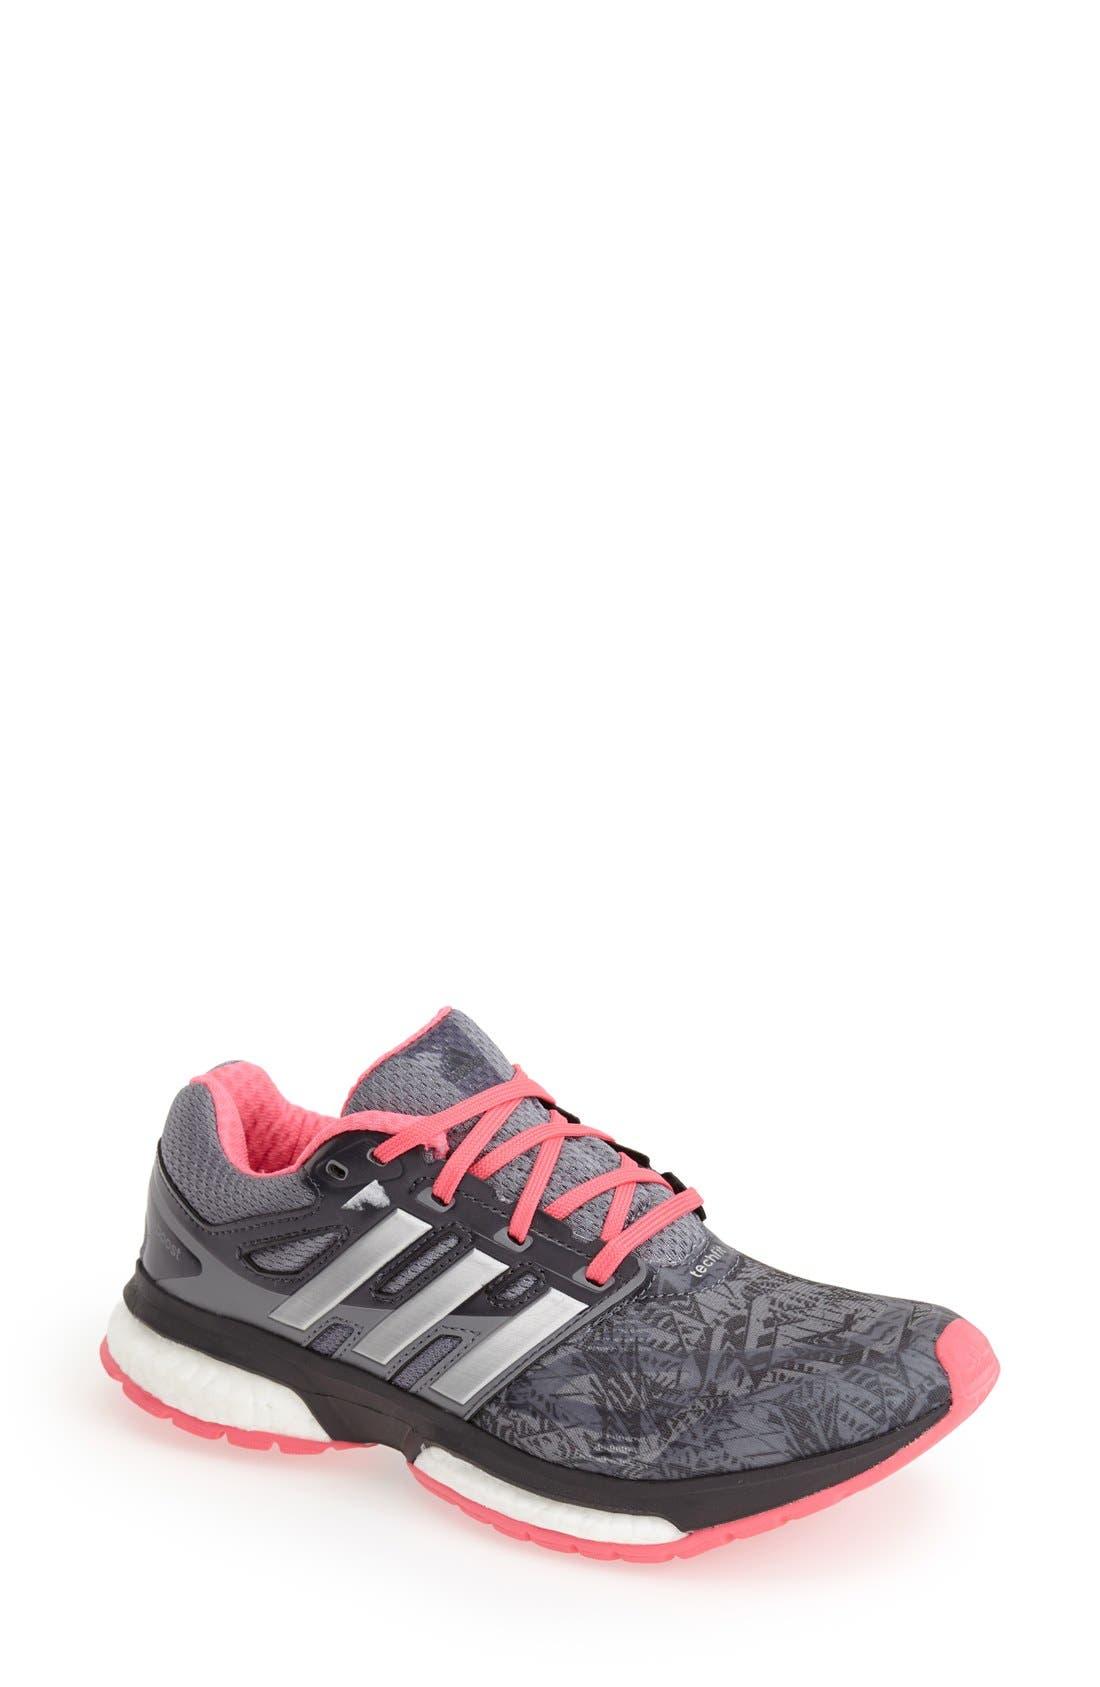 Main Image - adidas 'Response Boost' Running Shoe (Women)